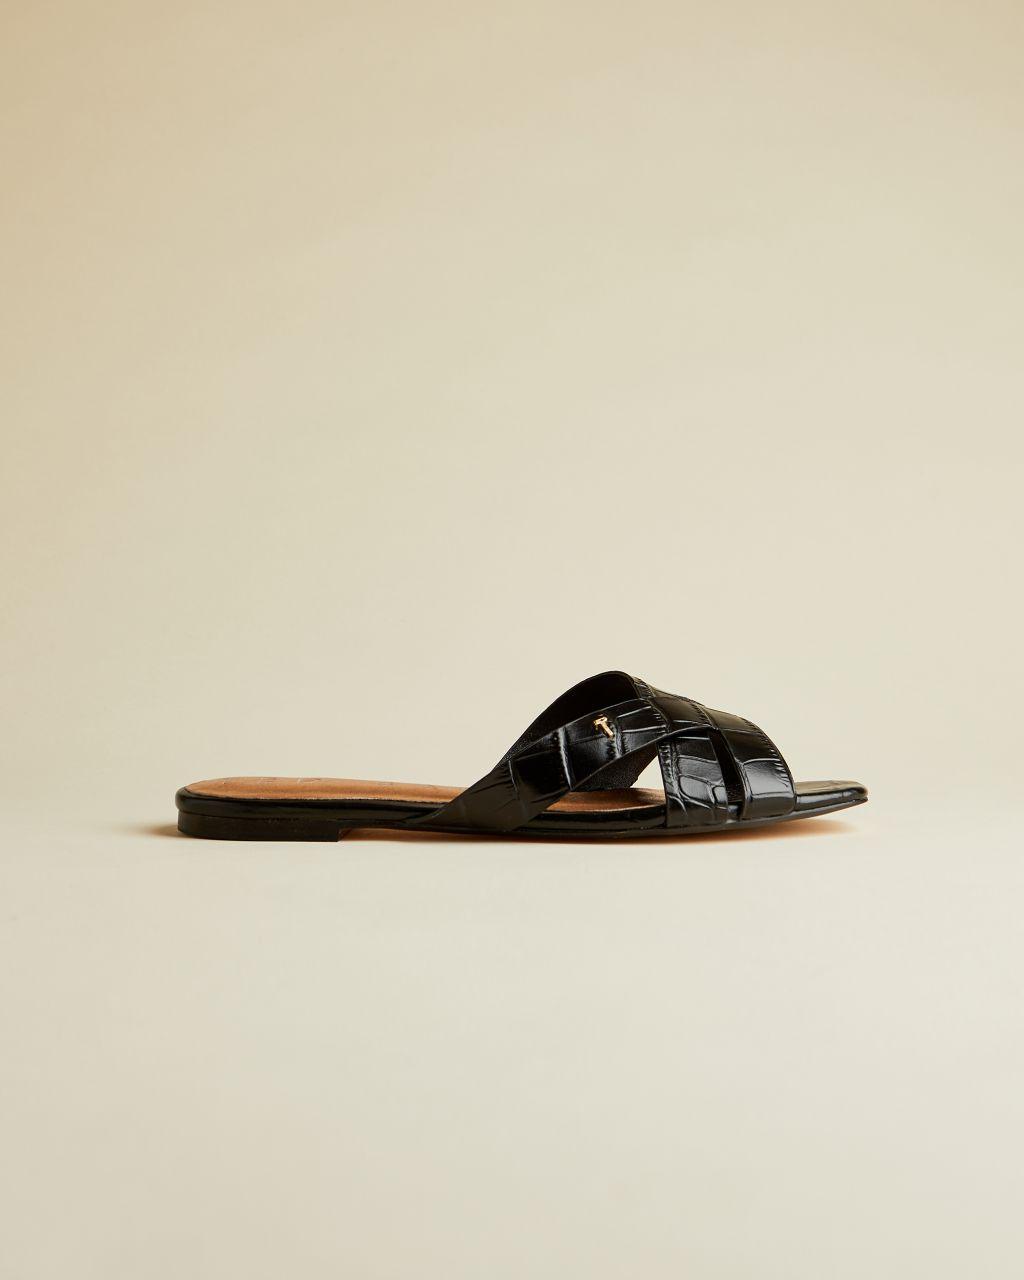 Ted Baker Leather Croc Effect Flat Sandal  - Black - Size: UK 4 (EU 37)